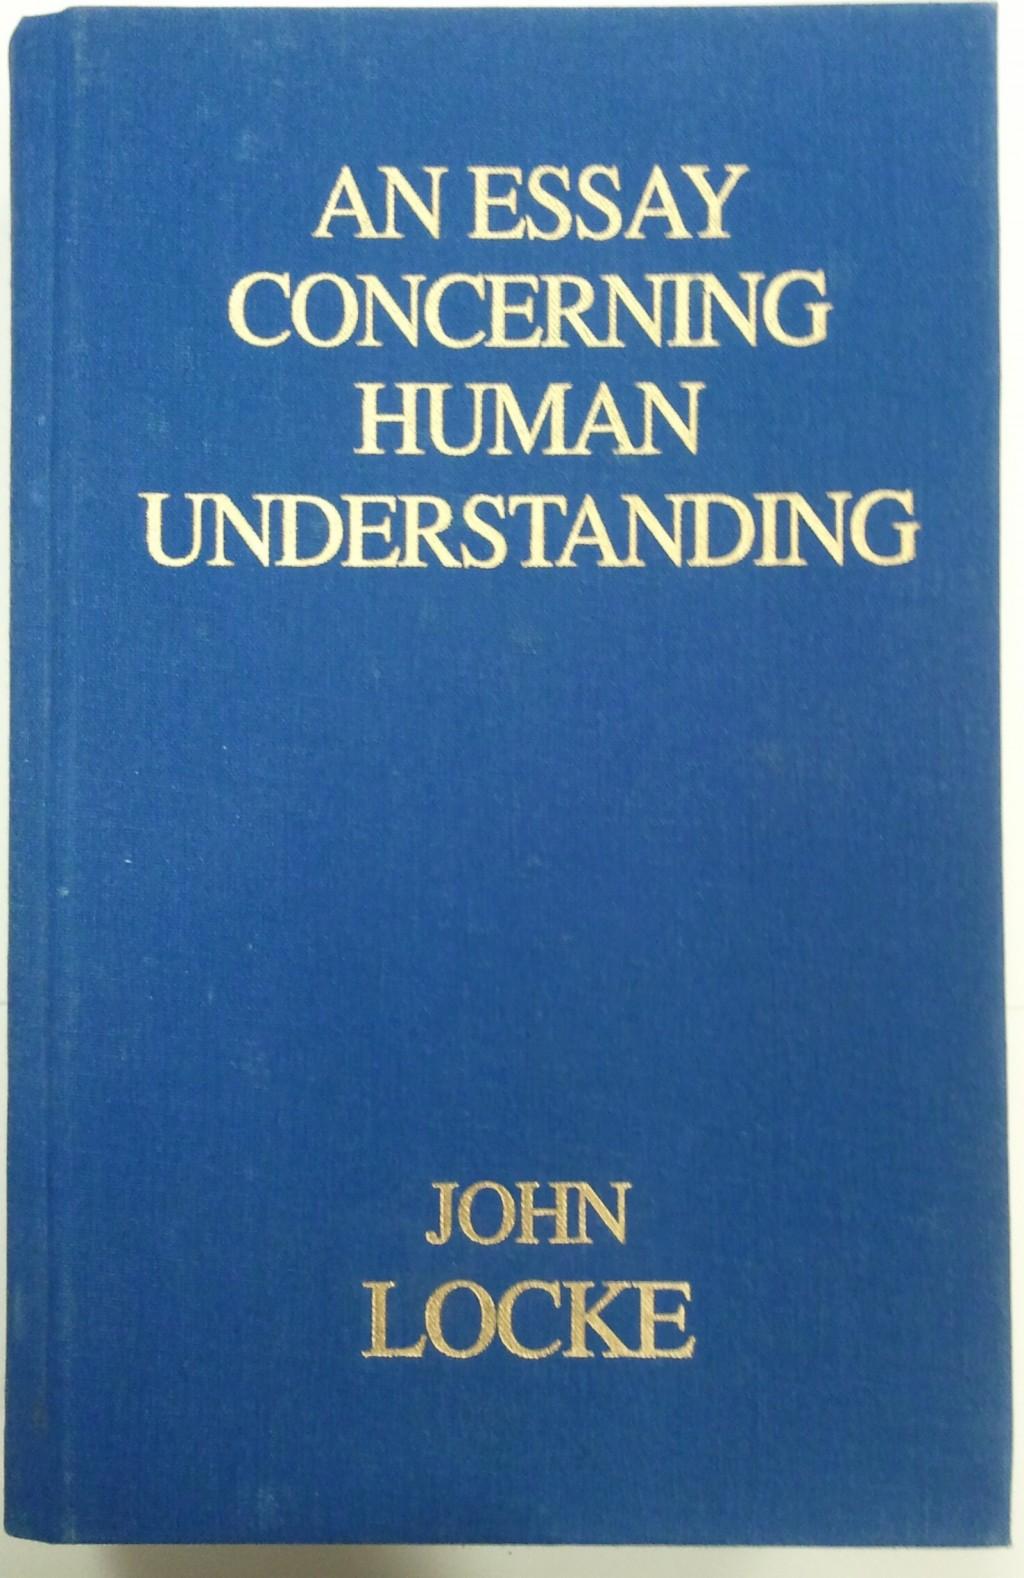 008 John Locke Essay Example Impressive Concerning Human Understanding Book 4 On Pdf Summary Large